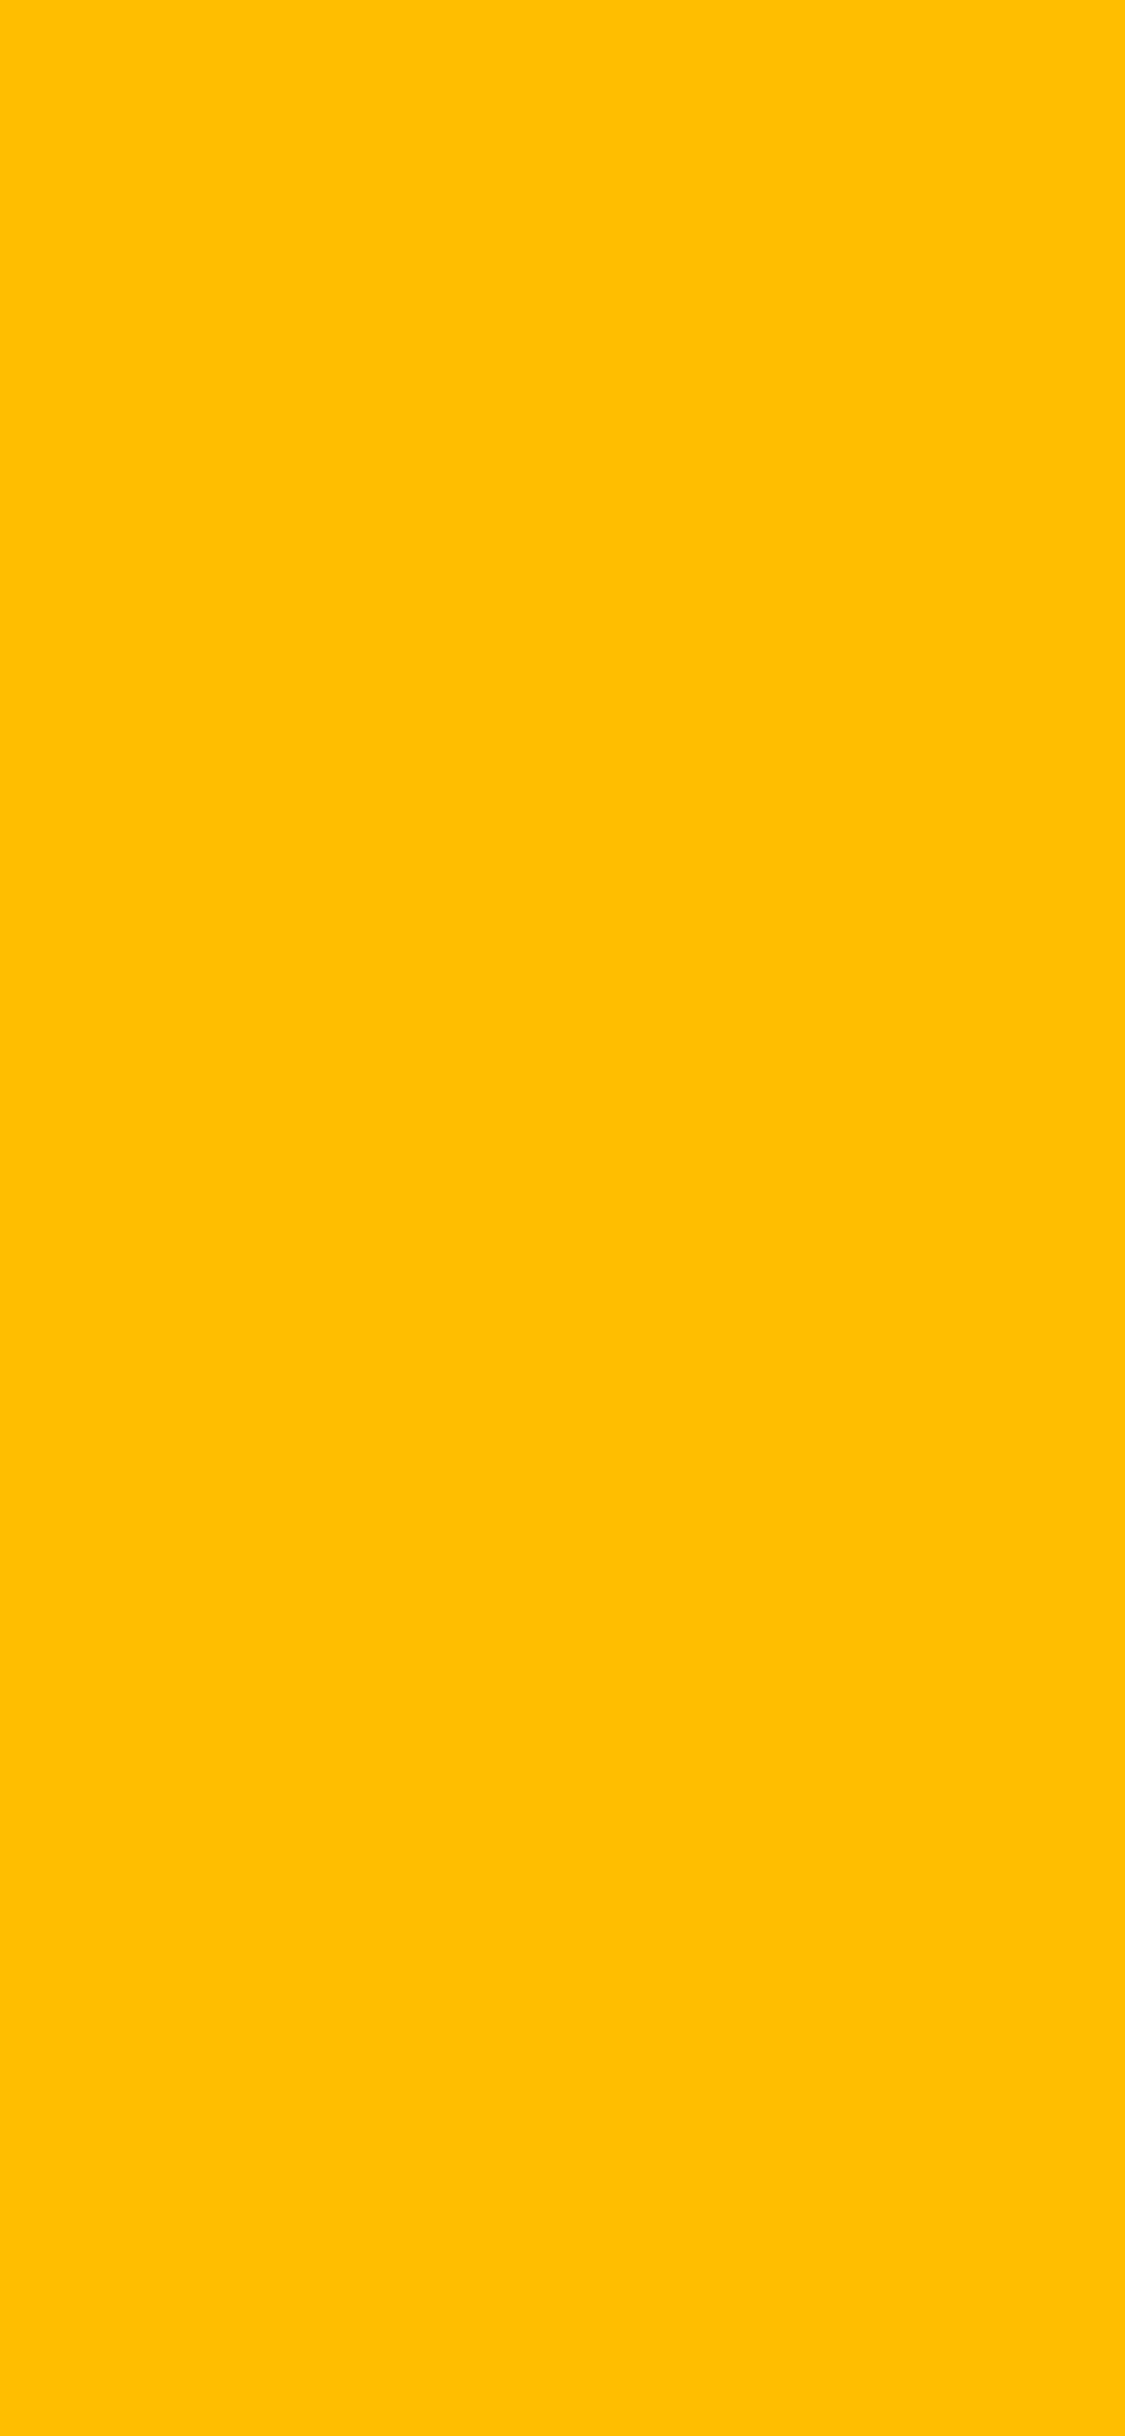 1125x2436 Fluorescent Orange Solid Color Background